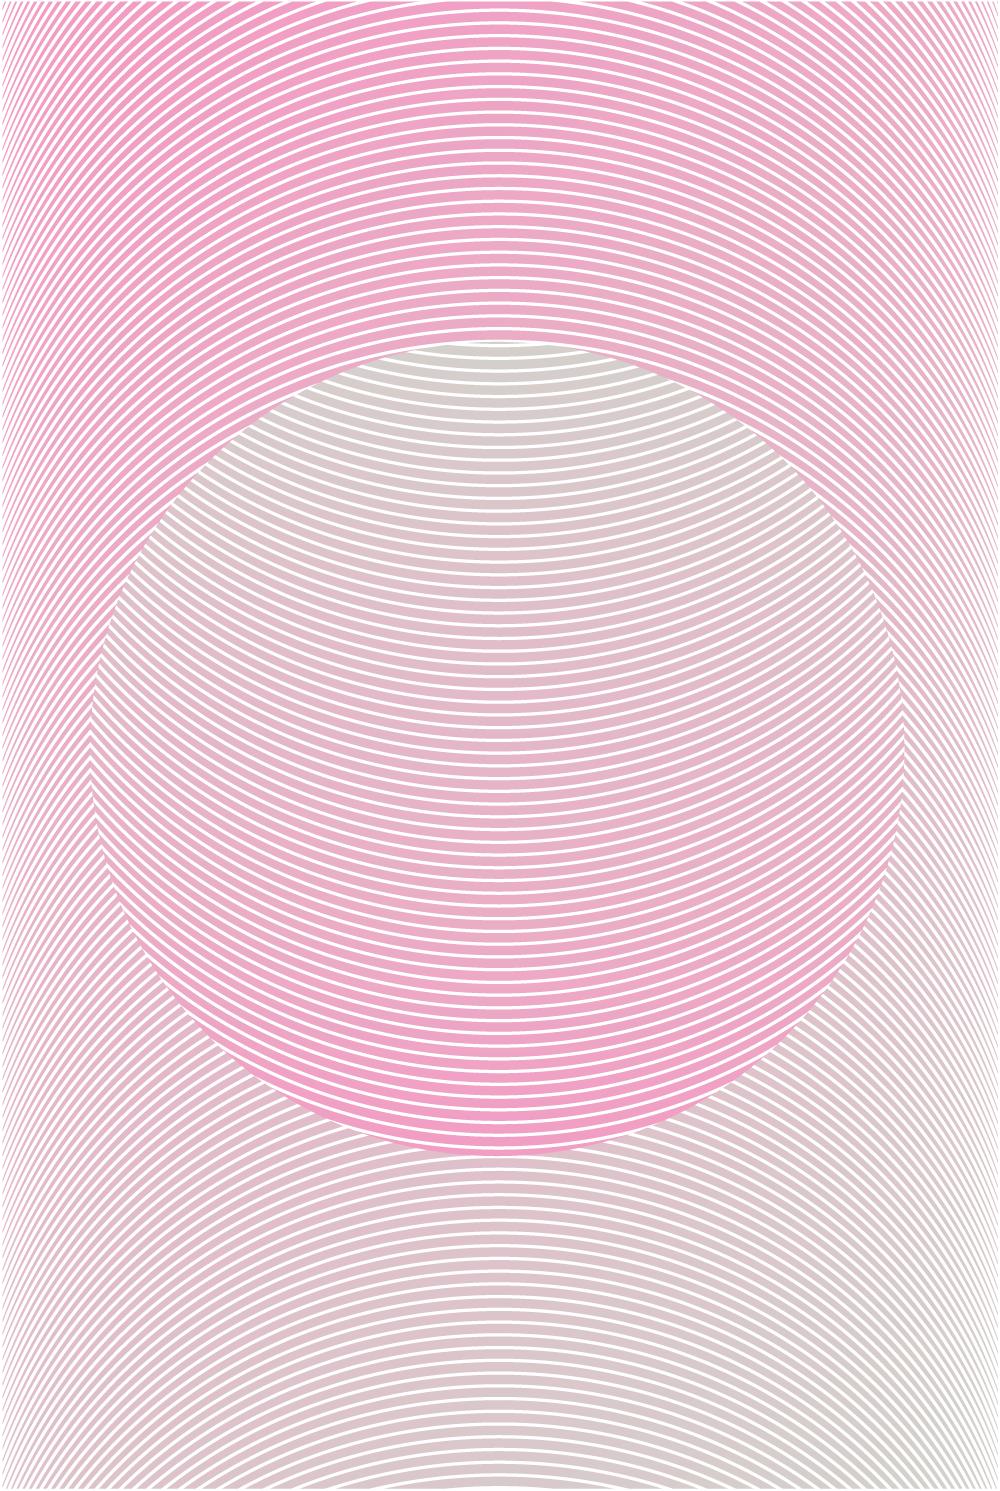 Graphisme de Sandrine Pilloud  Angel Hypnose   Cartes de visite verso